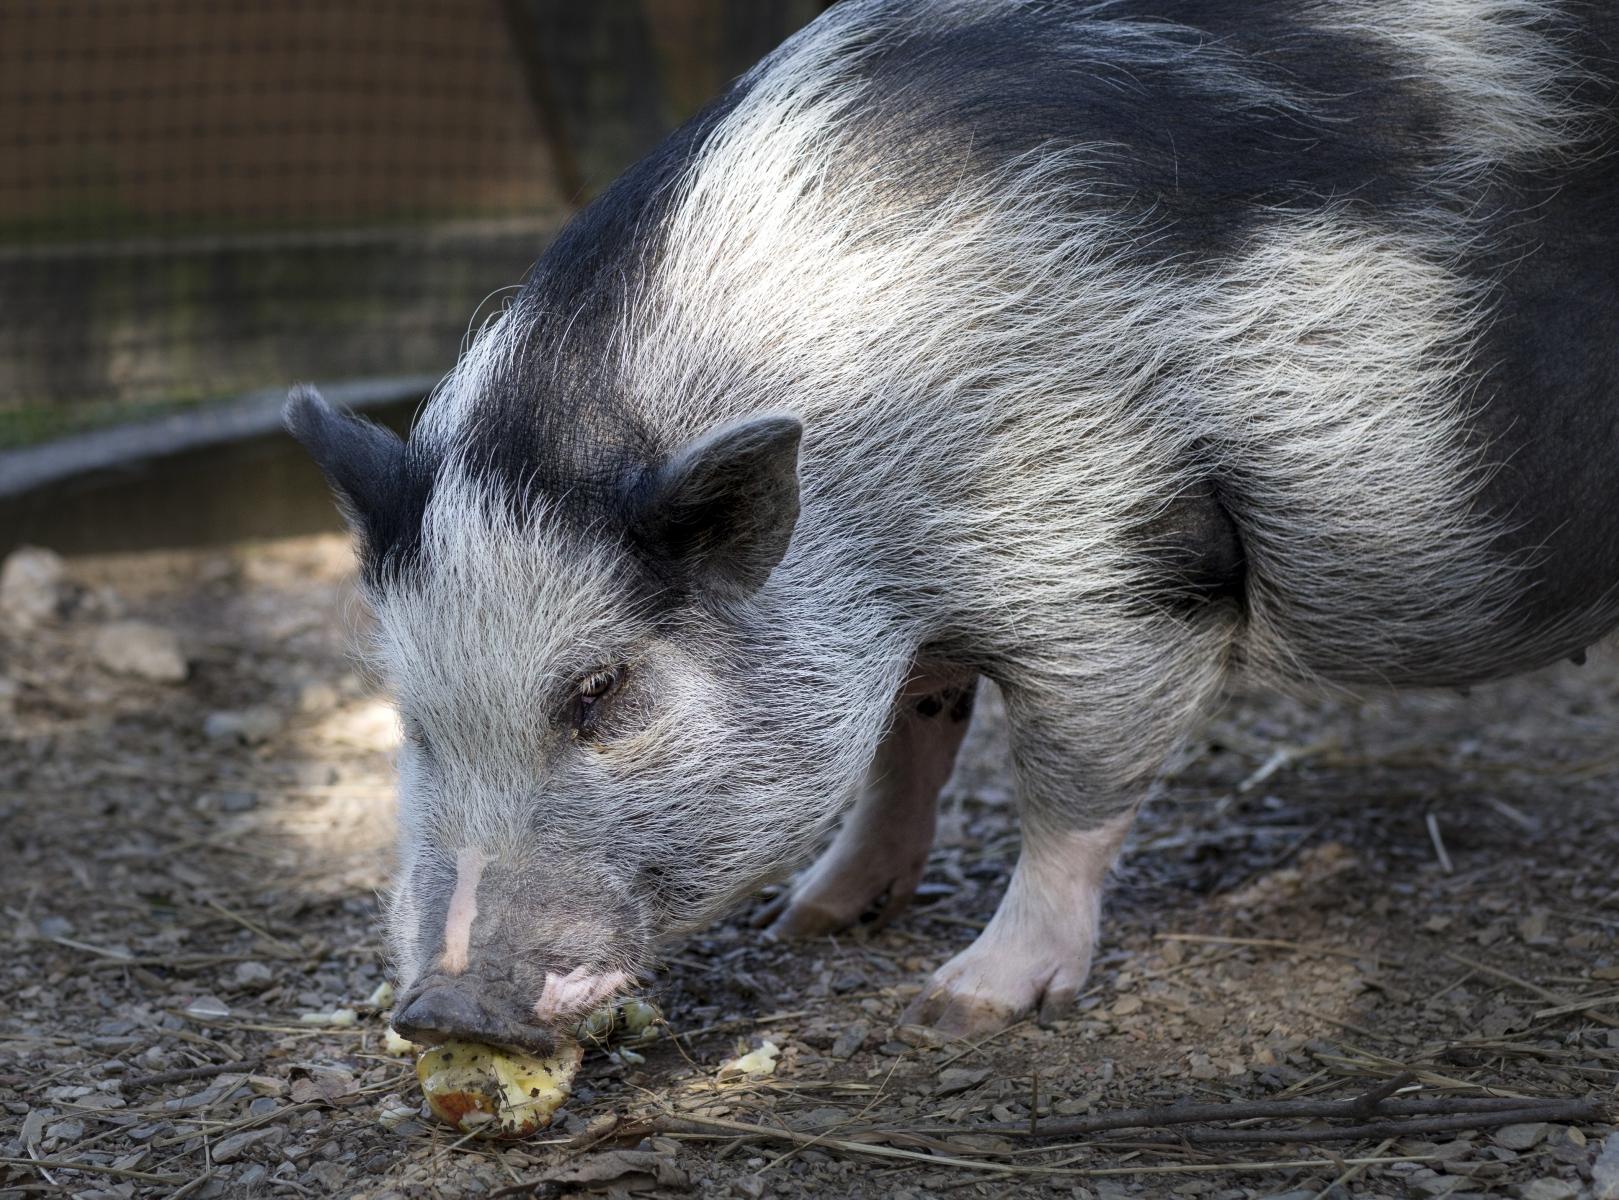 Pigsley